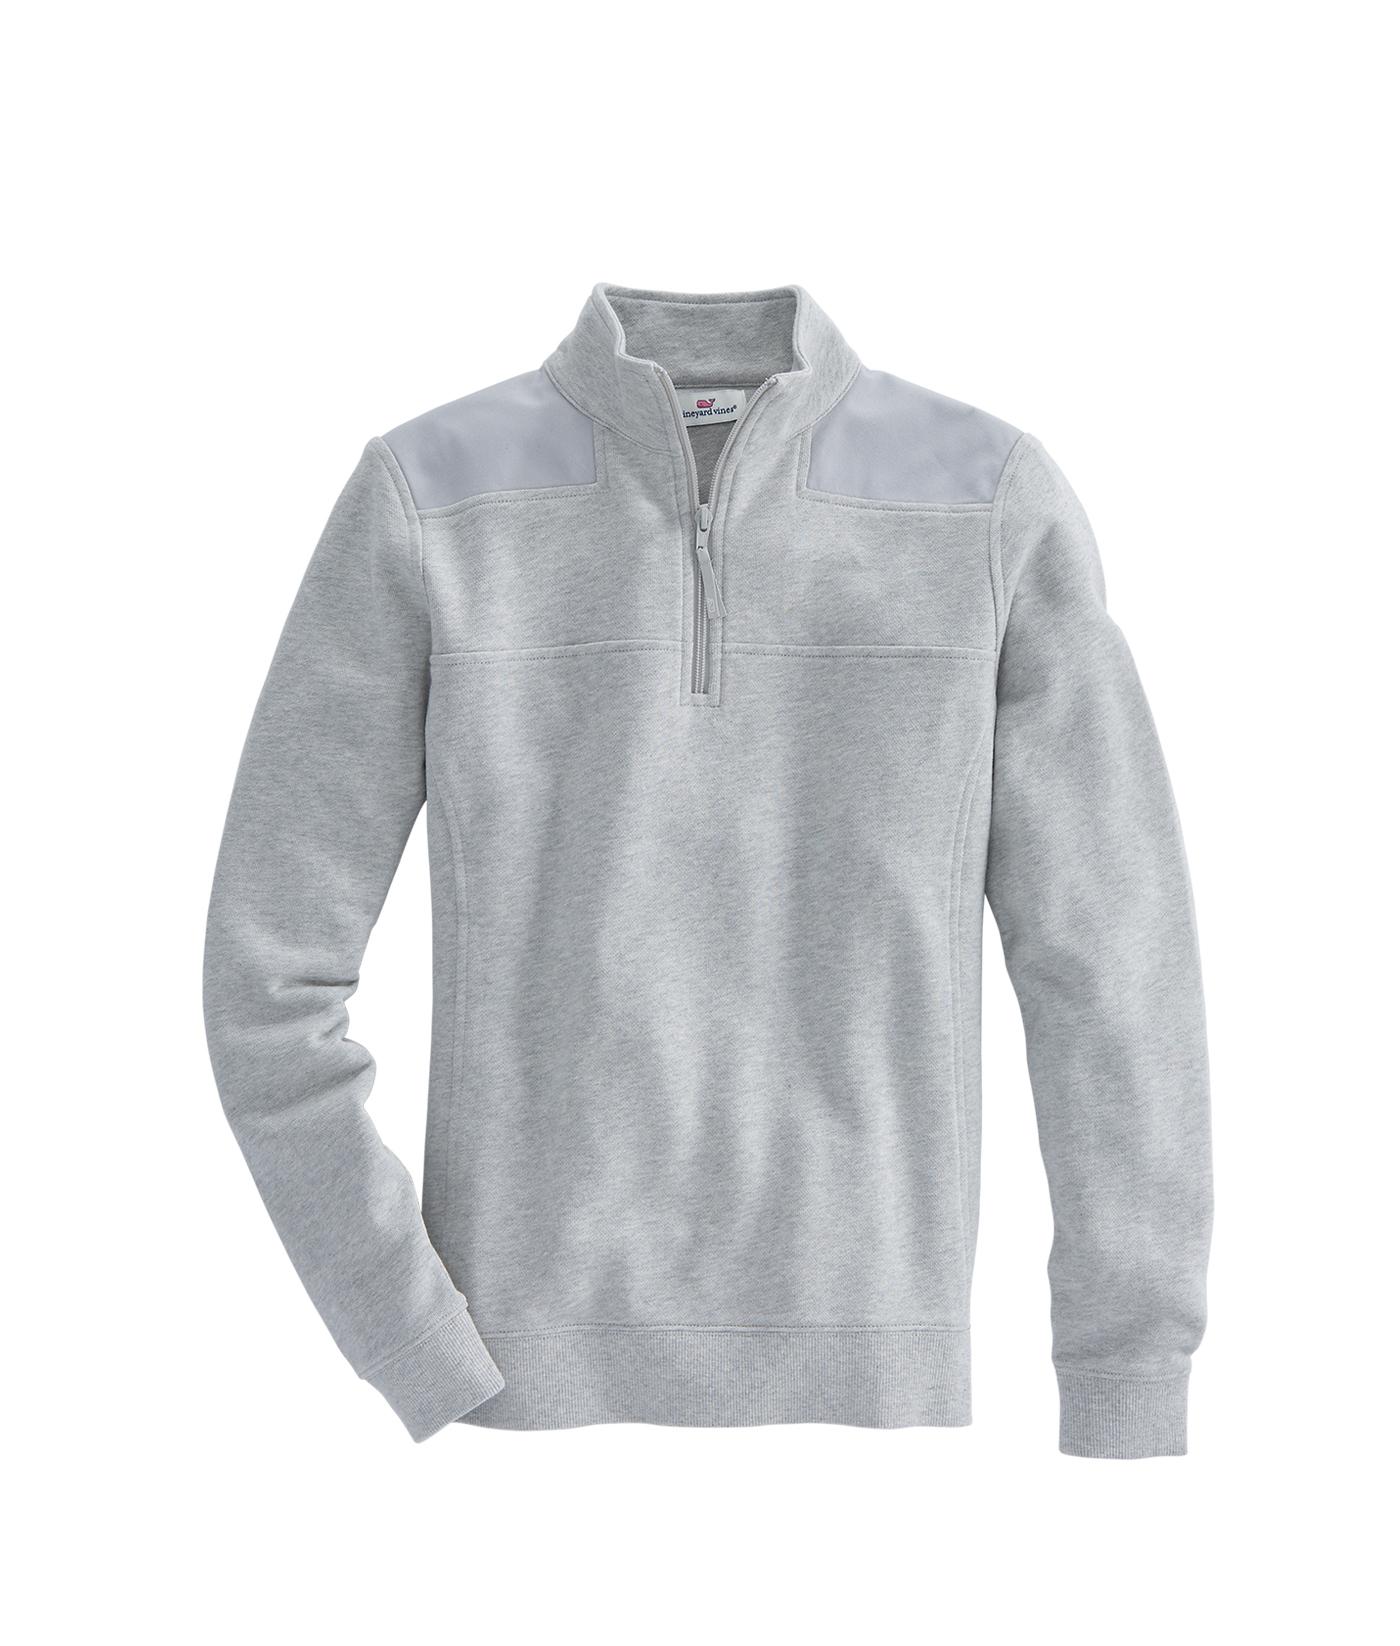 the latest 422a9 3b5c0 Womens Shep Shirt